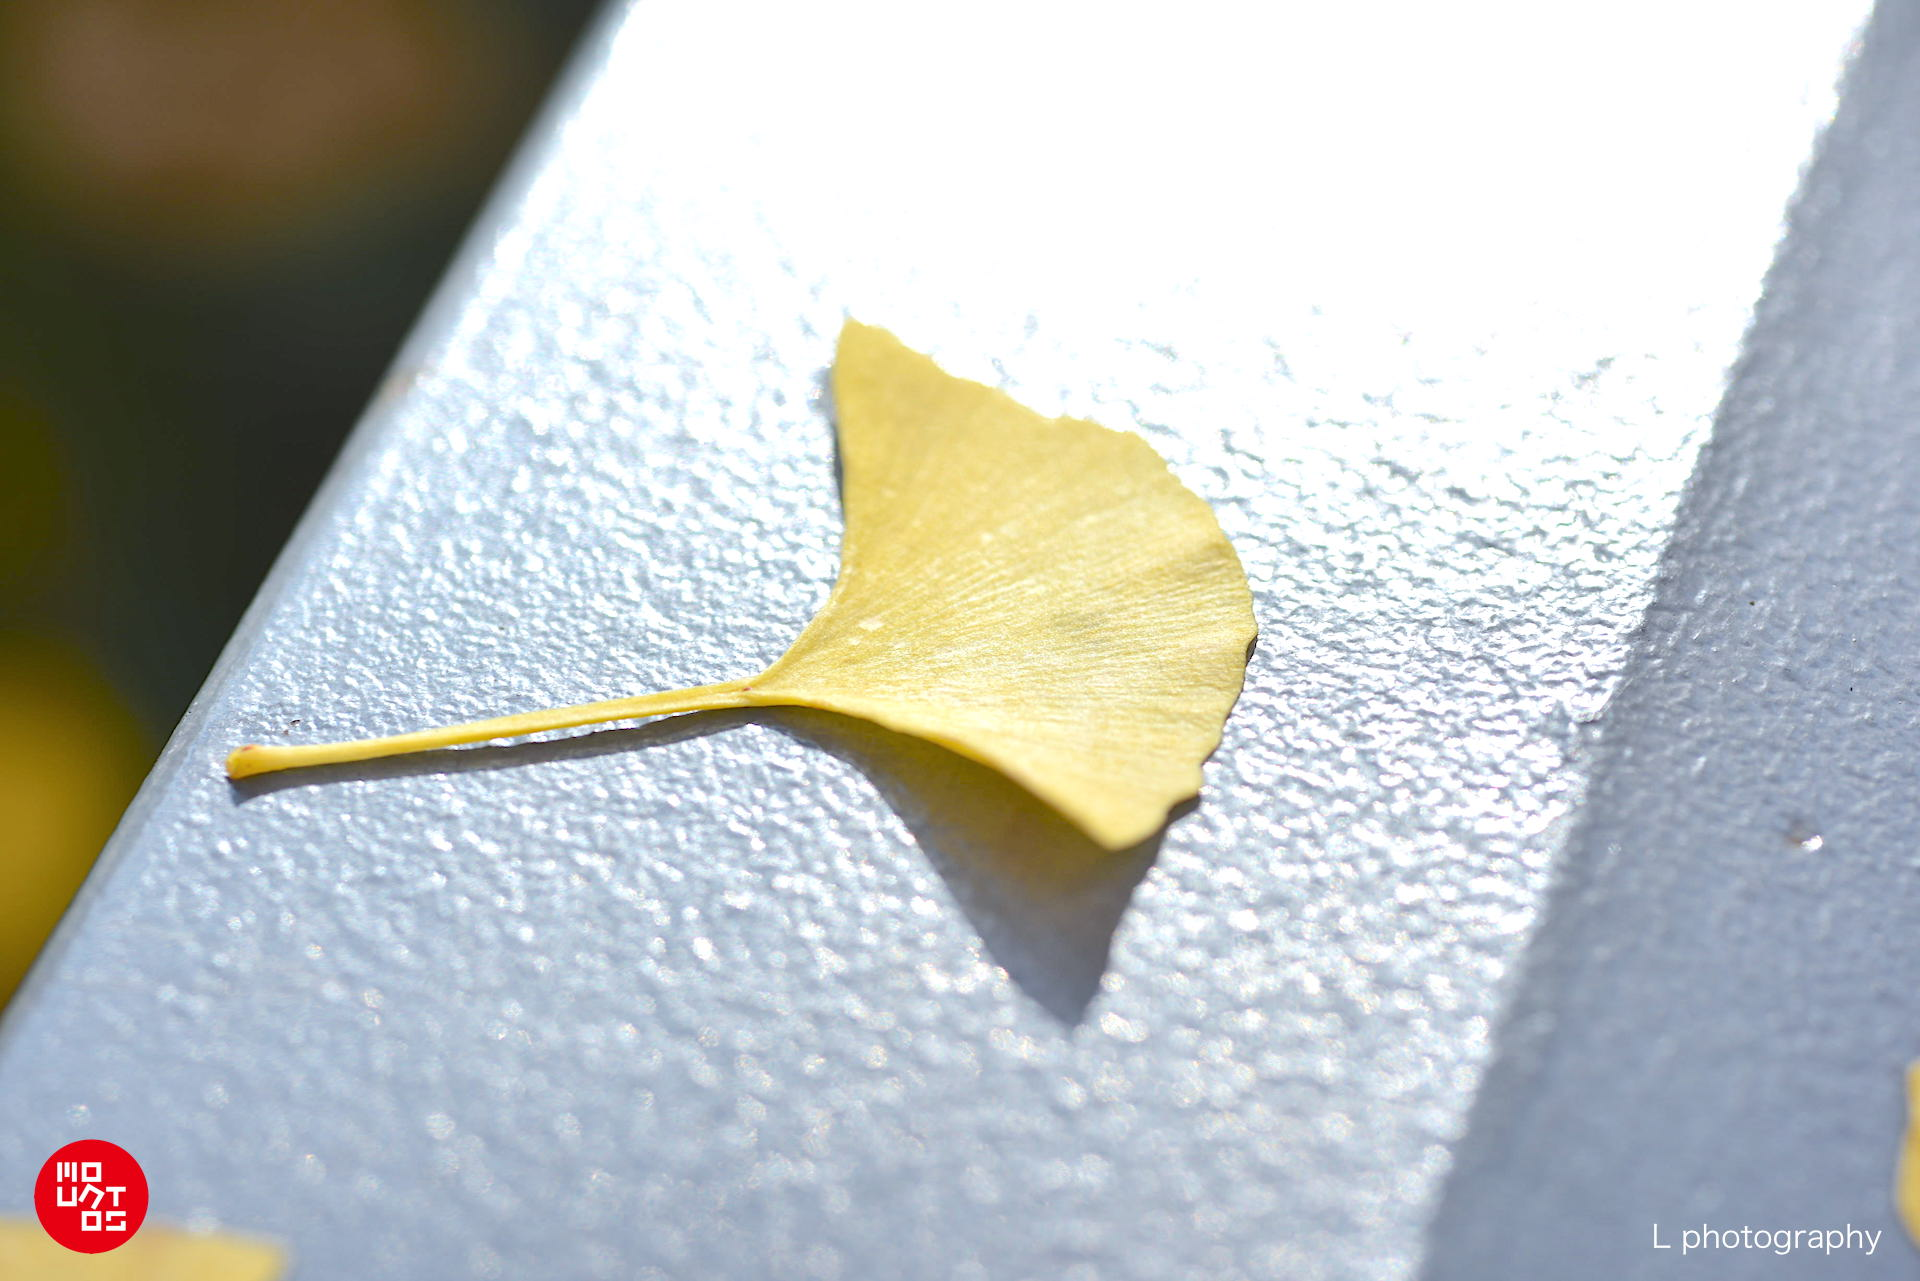 Ginkgo biloba leaf Yokohama Tokyo Japan autumn fall 銀杏/兒童、孕婦與授乳期婦女禁止食用銀杏葉果及其製品